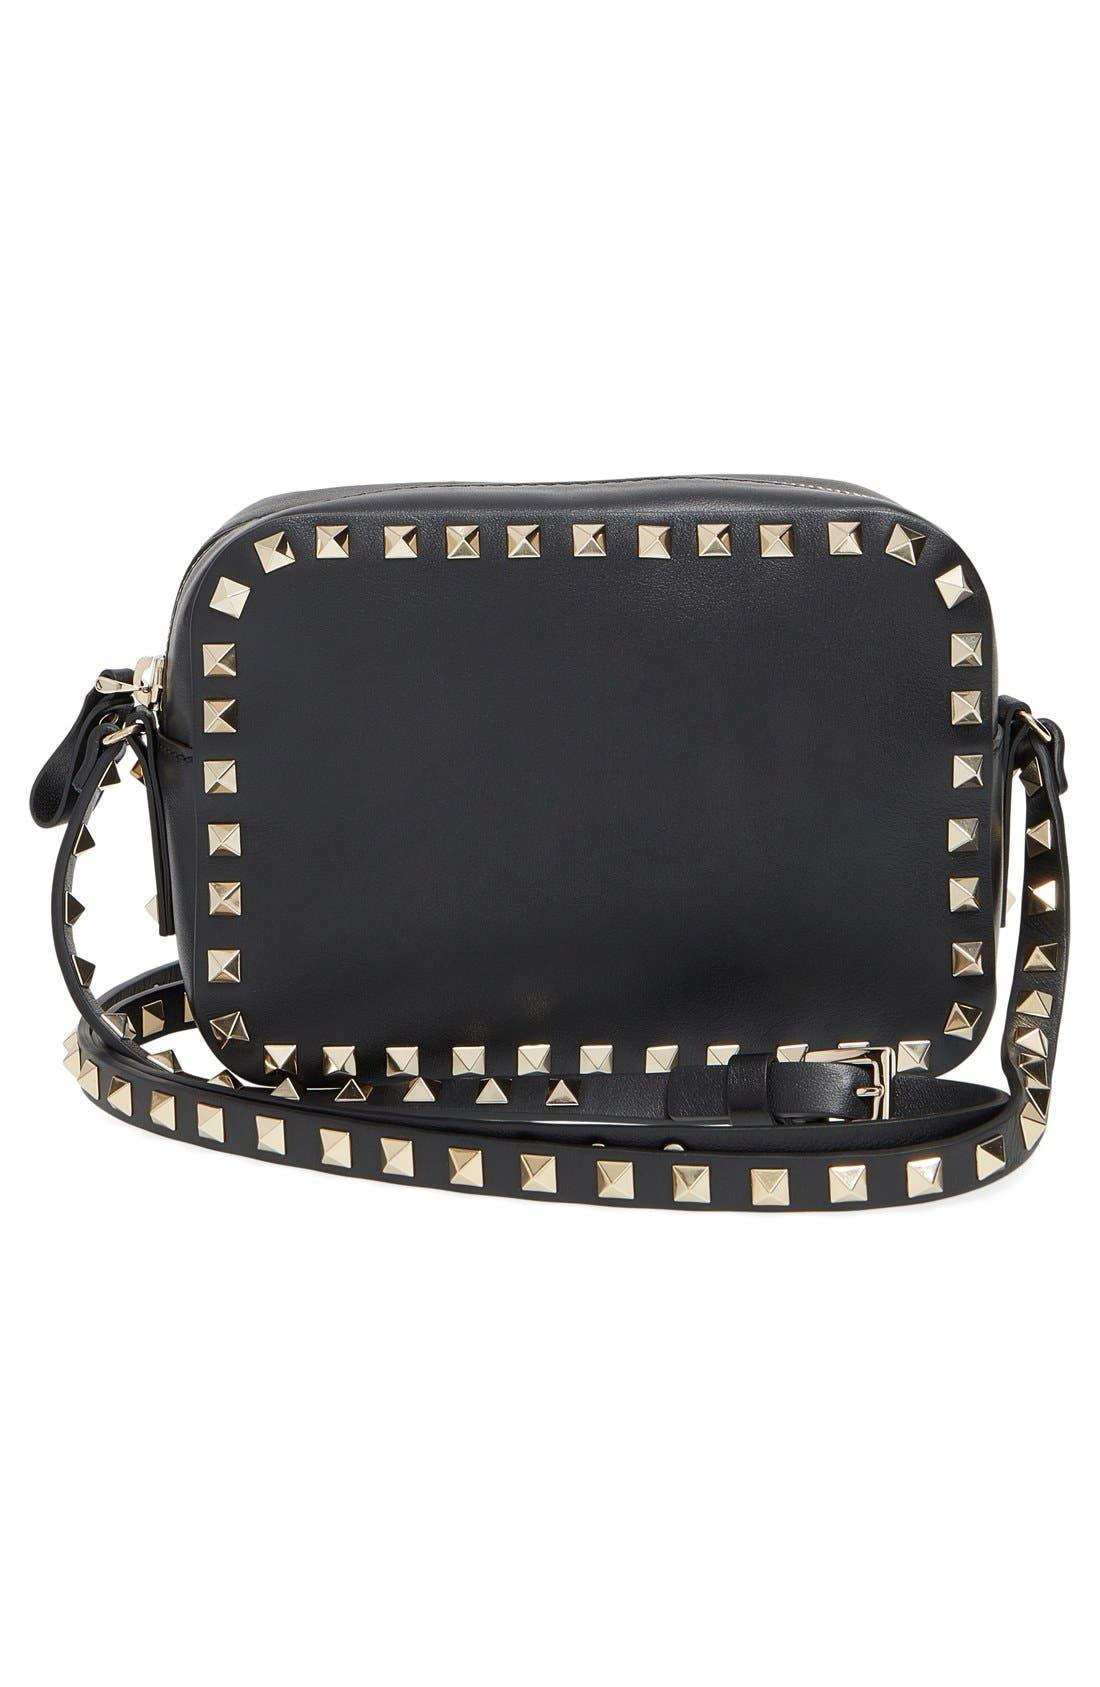 Alternate Image 1 Selected - Valentino 'Rockstud' Camera Crossbody Bag